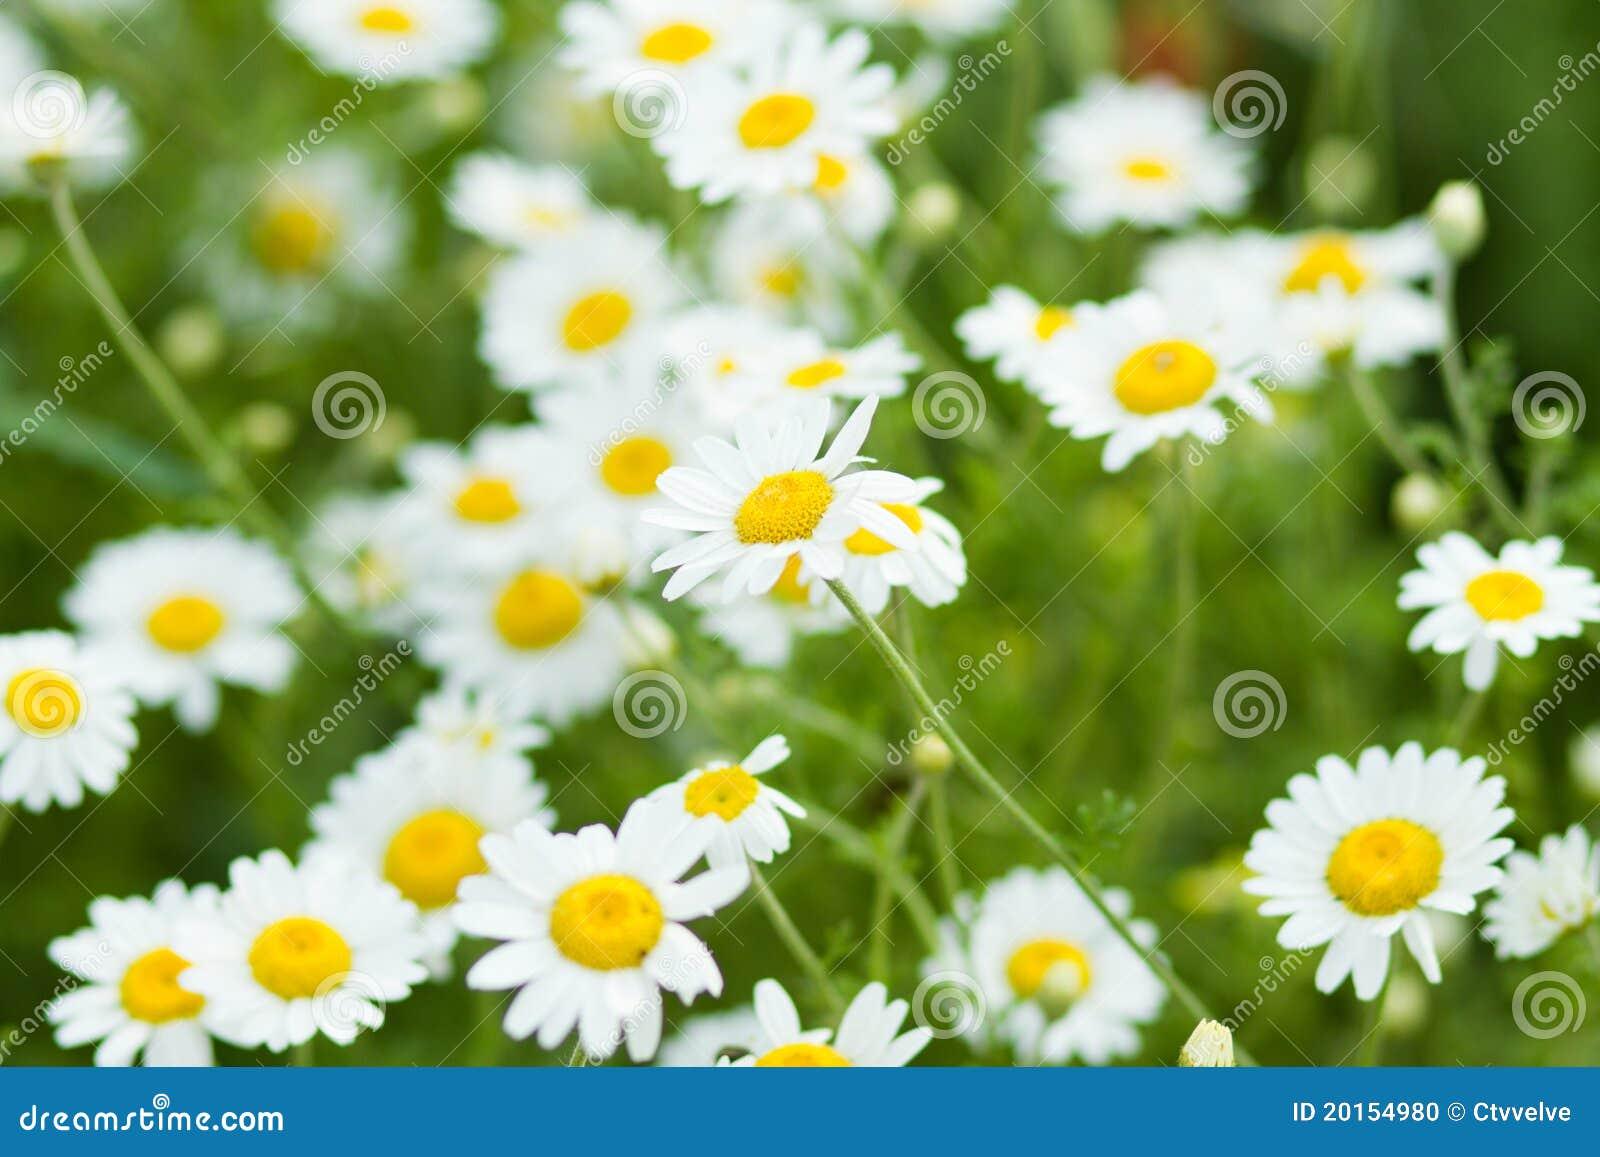 Summer flowers stock photo image of spring flora garden 20154980 summer flowers mightylinksfo